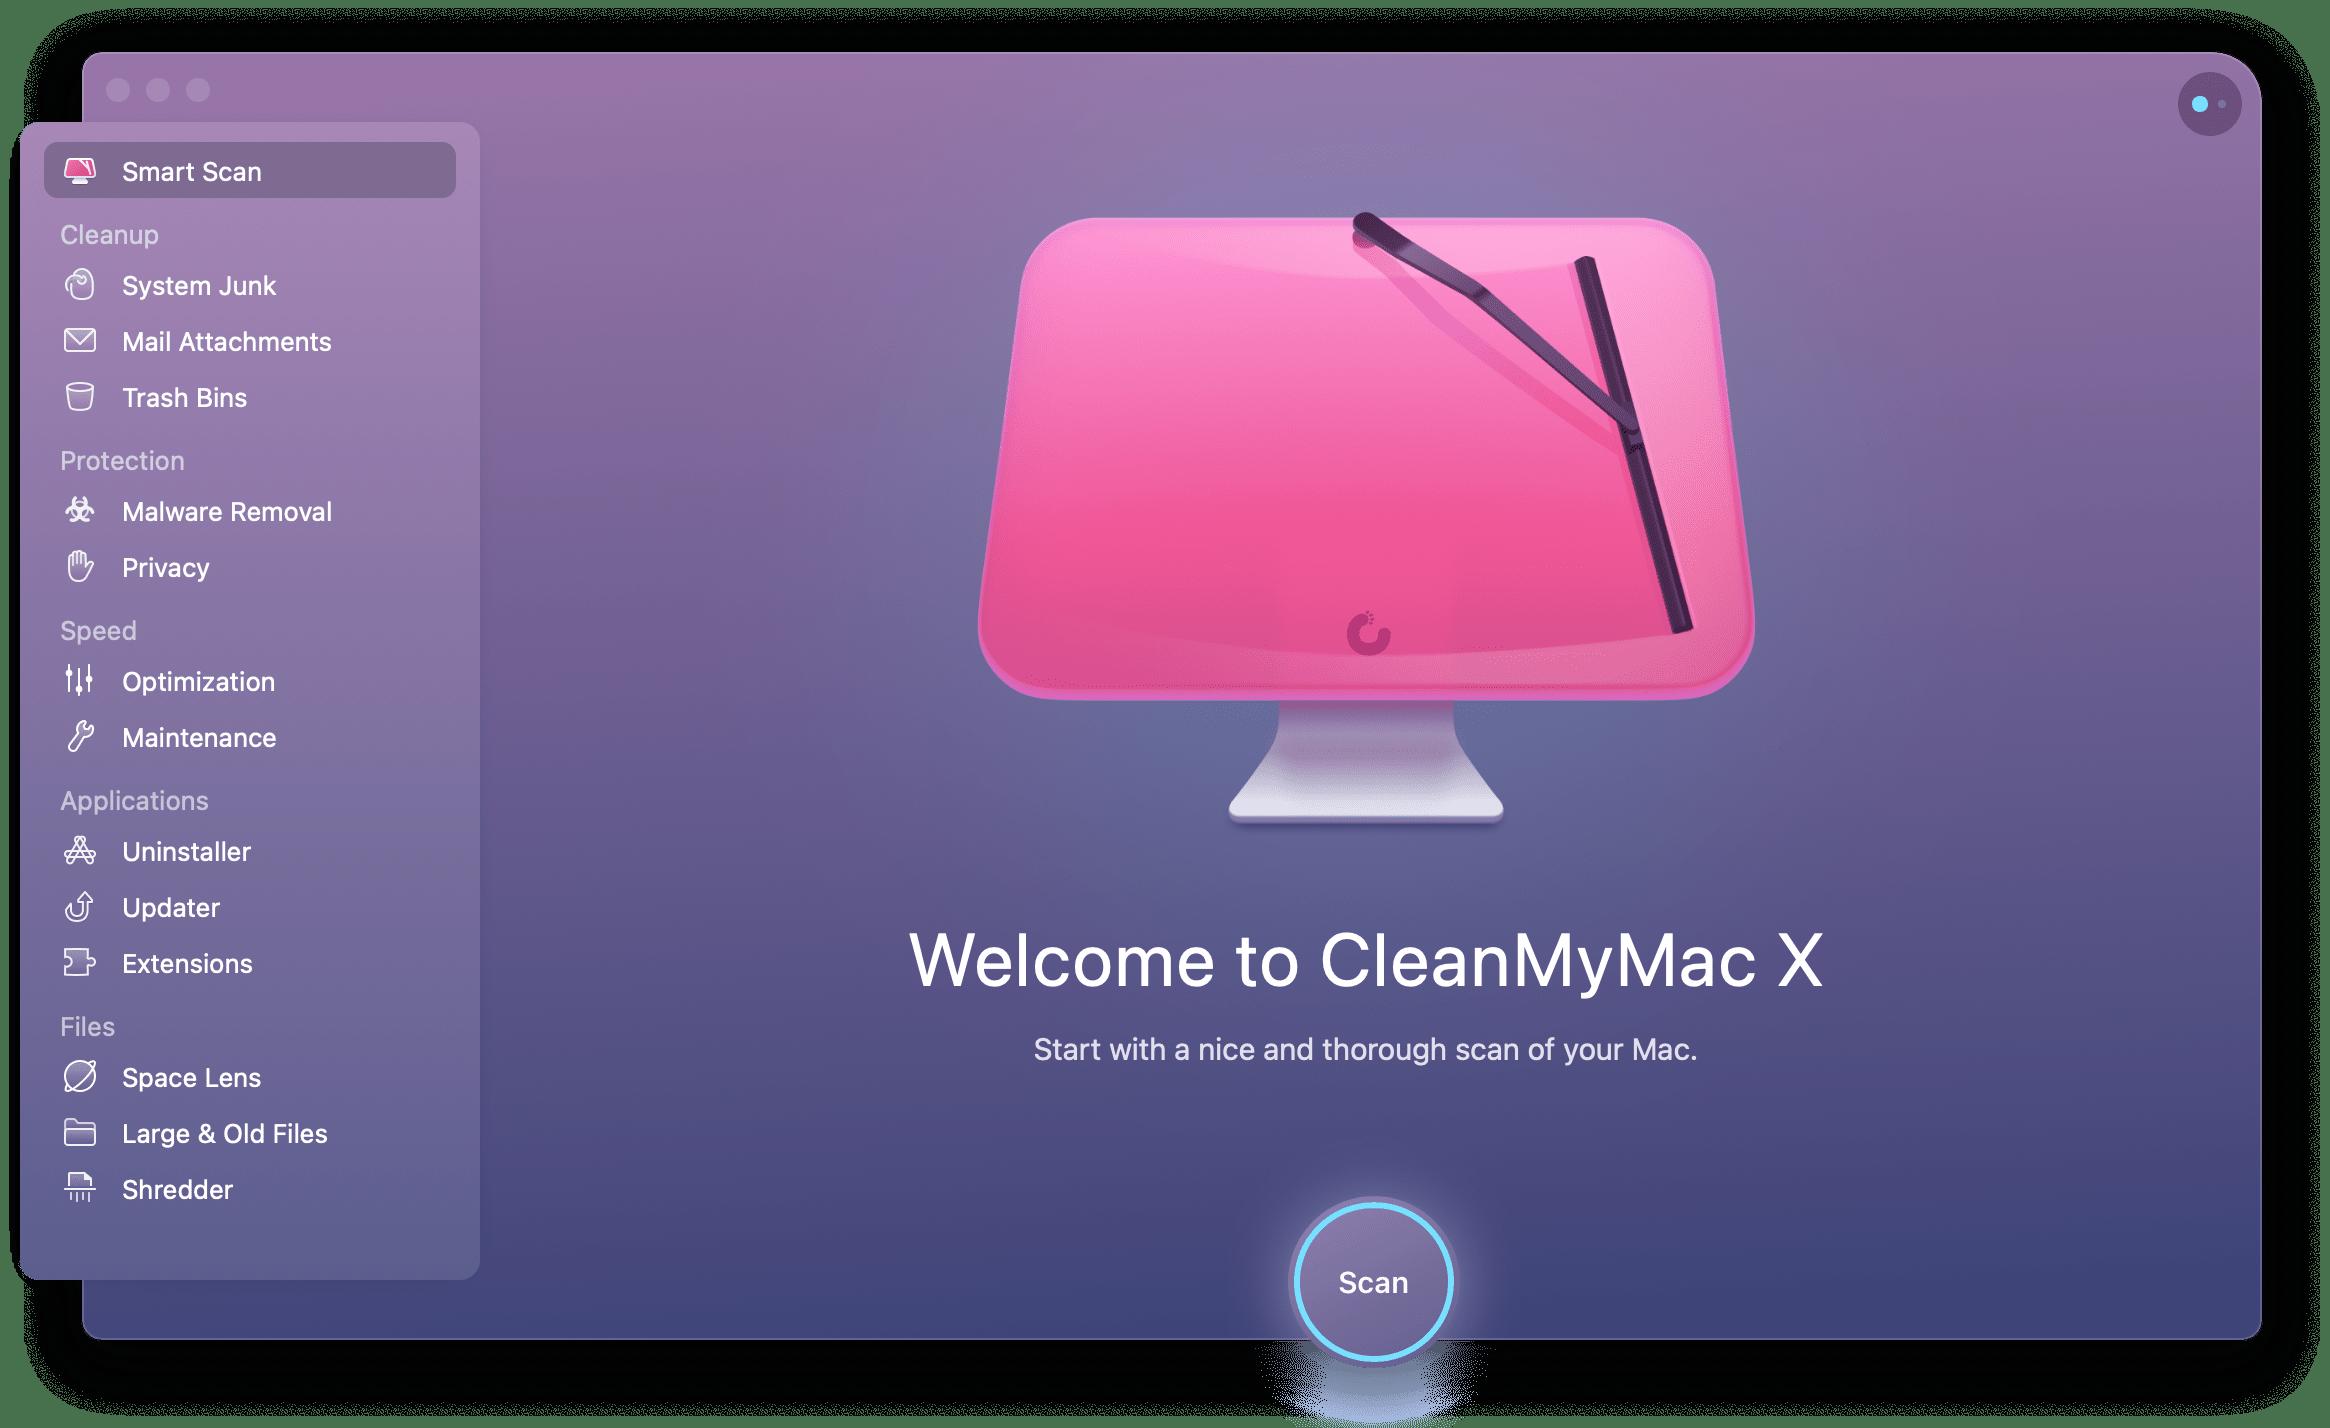 CleanMyMac X uninstaller utility